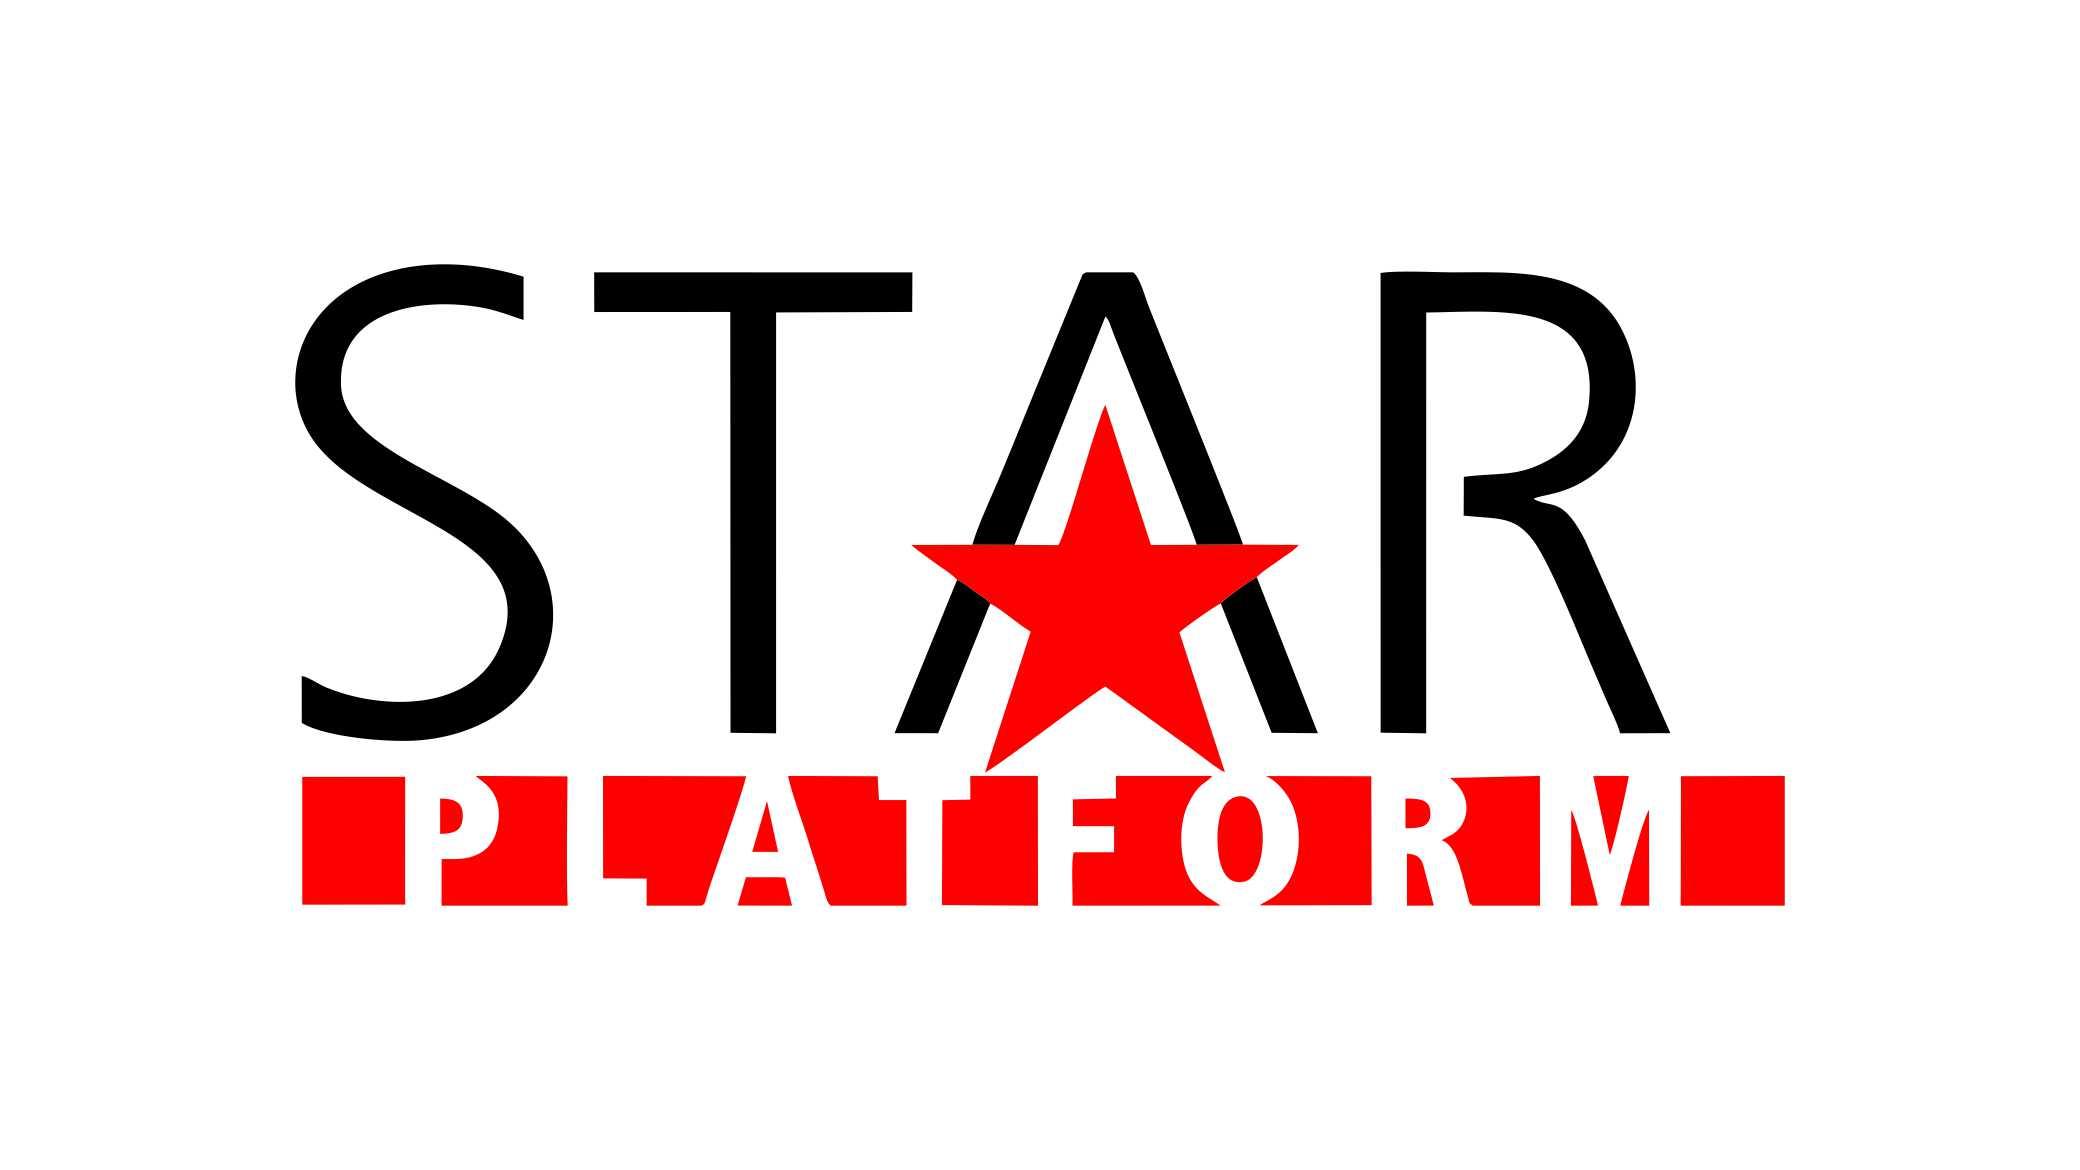 STAR Platform logo